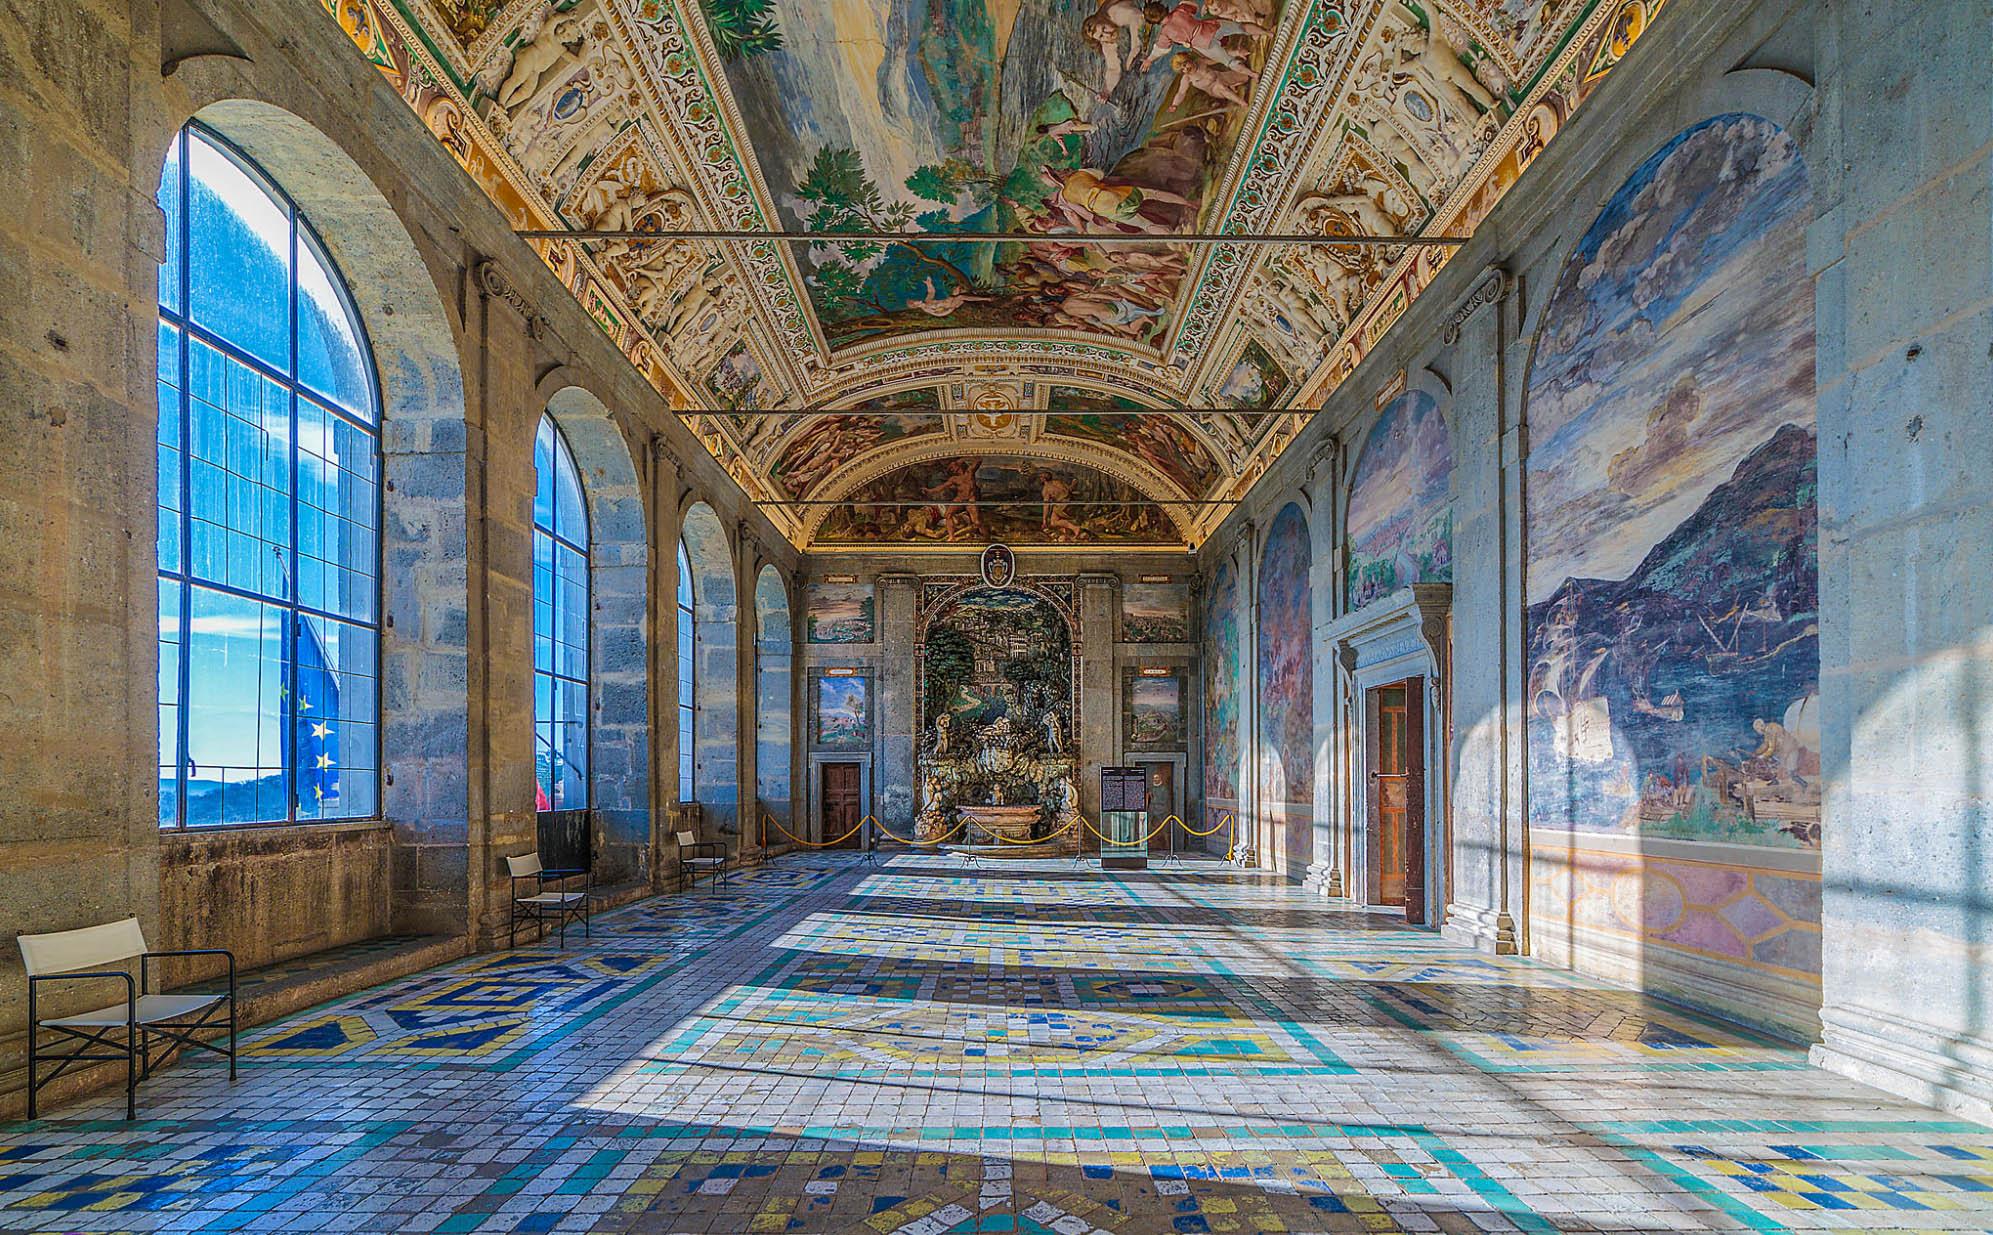 Зала в Палацо Фарнесе - Екскурзия в Лацио